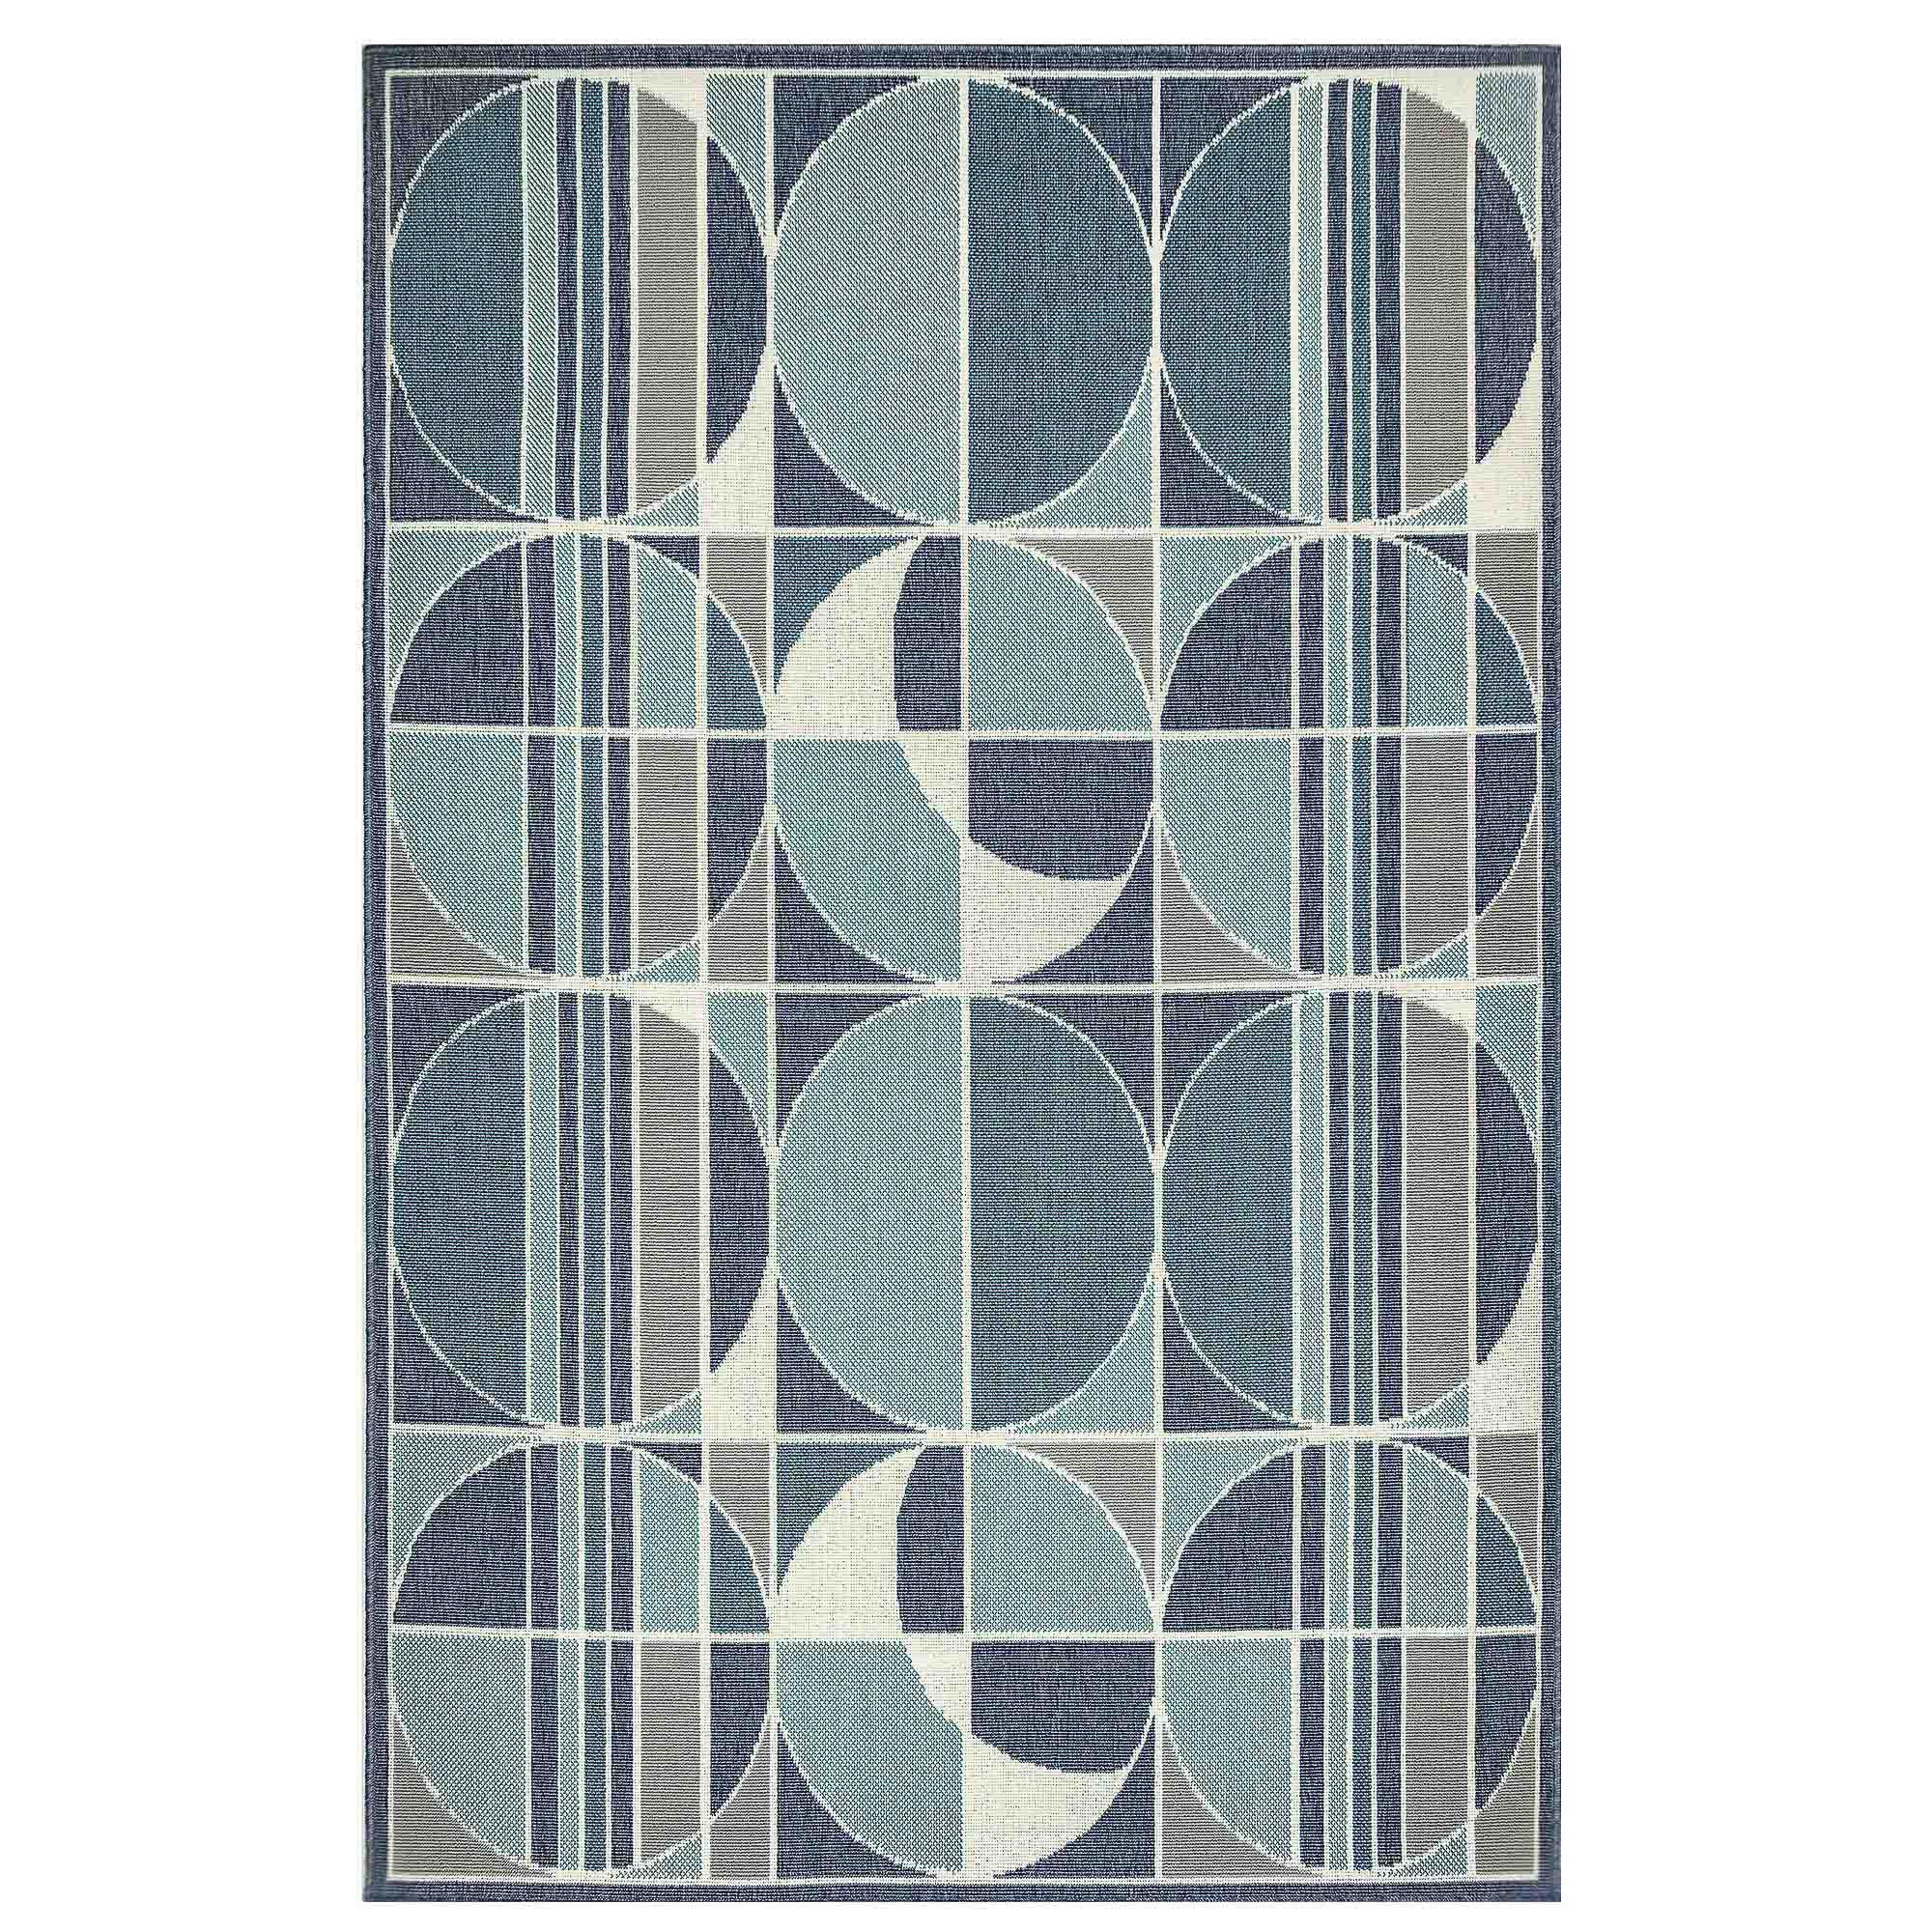 Ebern Designs Kinslow Circles Blue